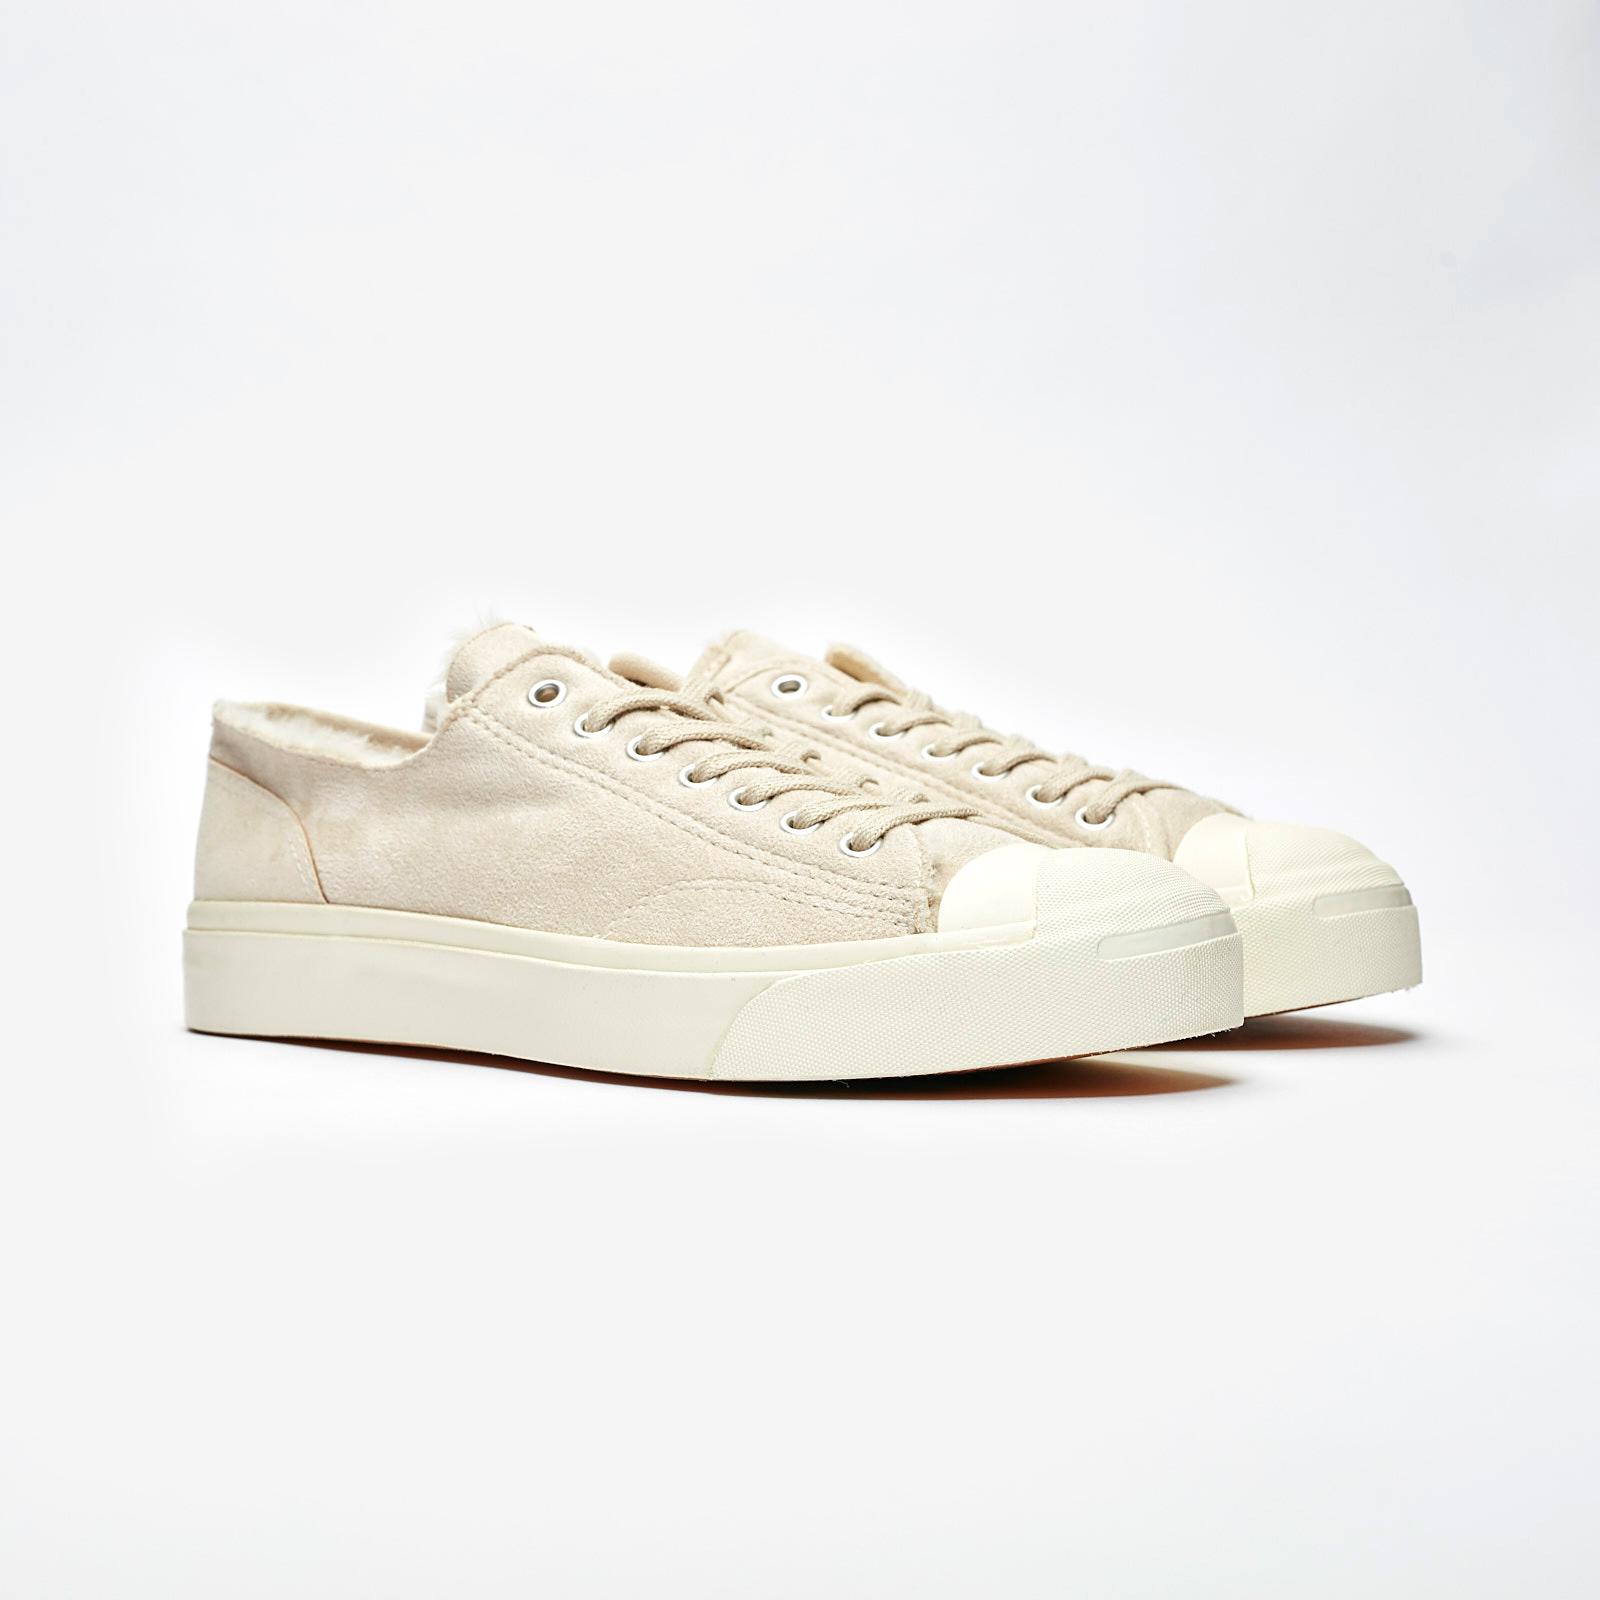 d220332c9cd7 Converse Jack Purcell x CLOT - 164534c - Sneakersnstuff